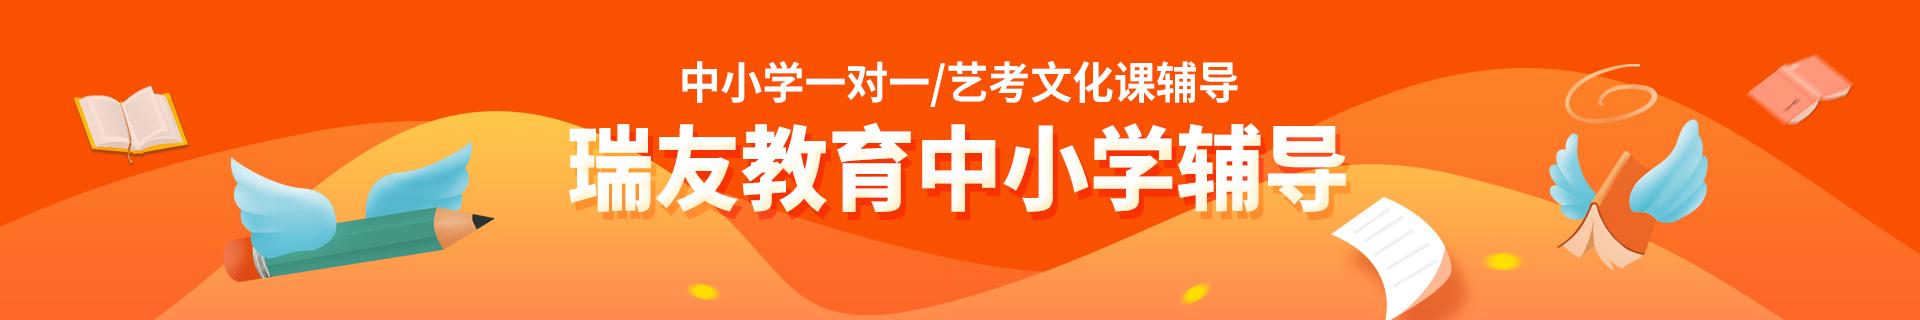 天津汉沽瑞友教育培训机构